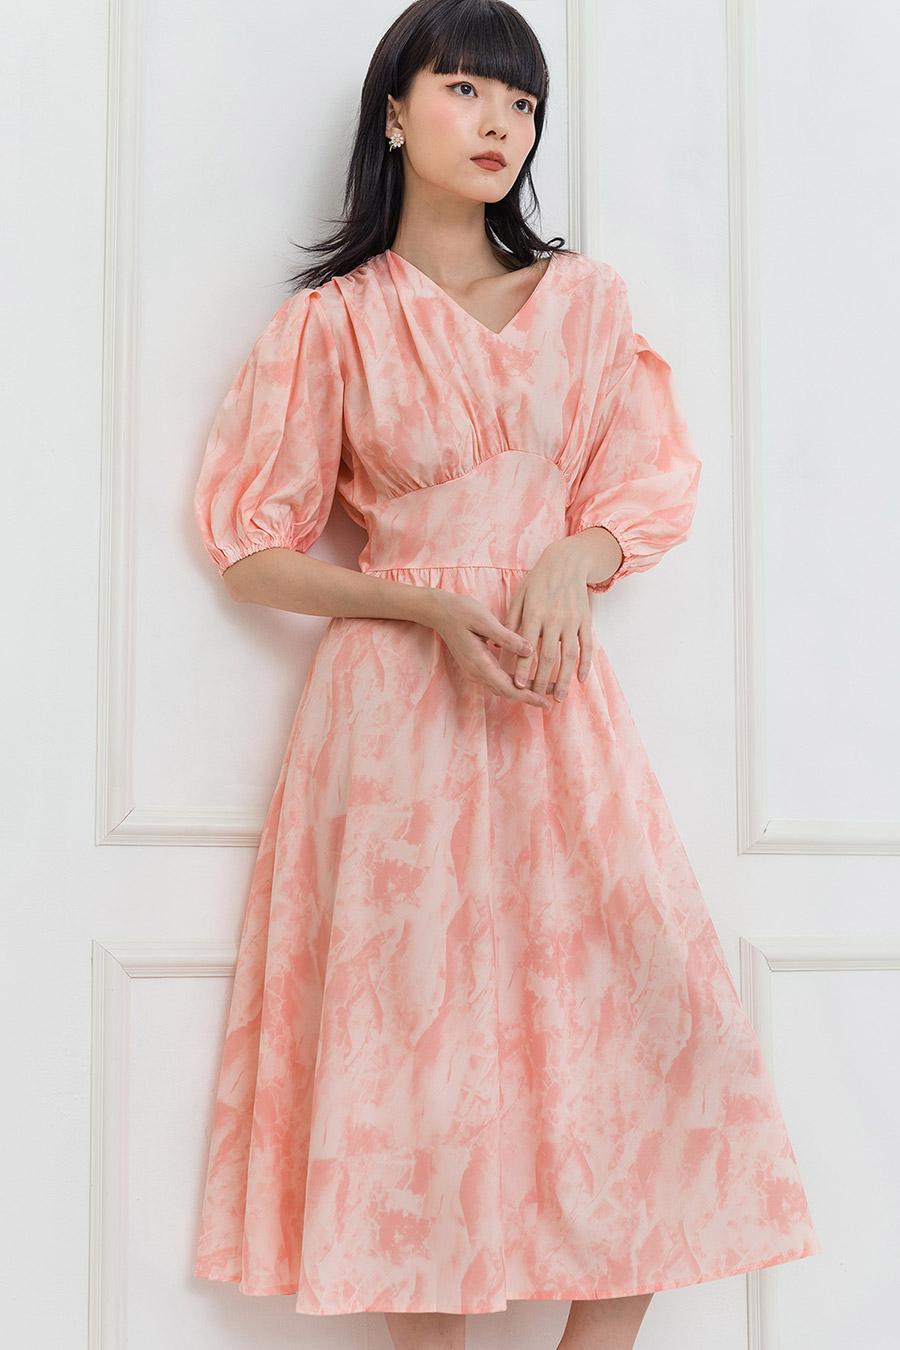 TANITH DRESS - SHERBERT